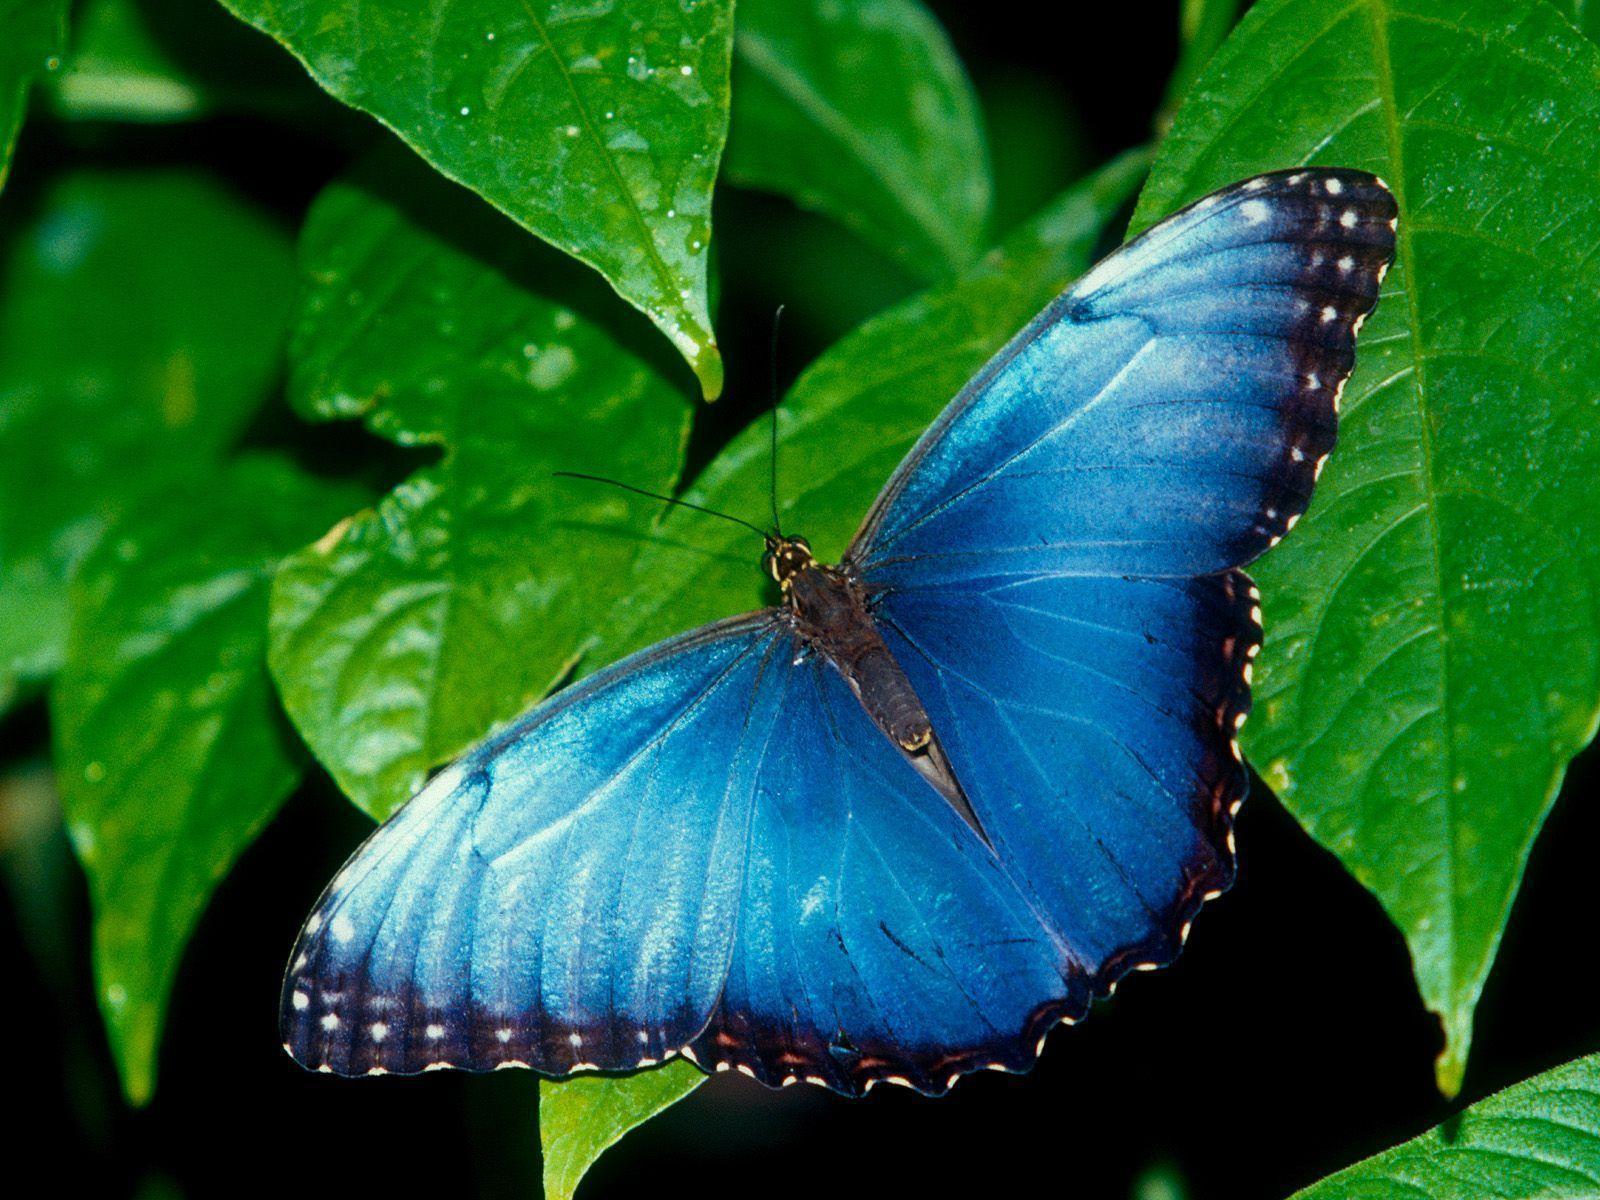 Butterfly Desktop Wallpaper | Butterfly Desktop Images | New ...